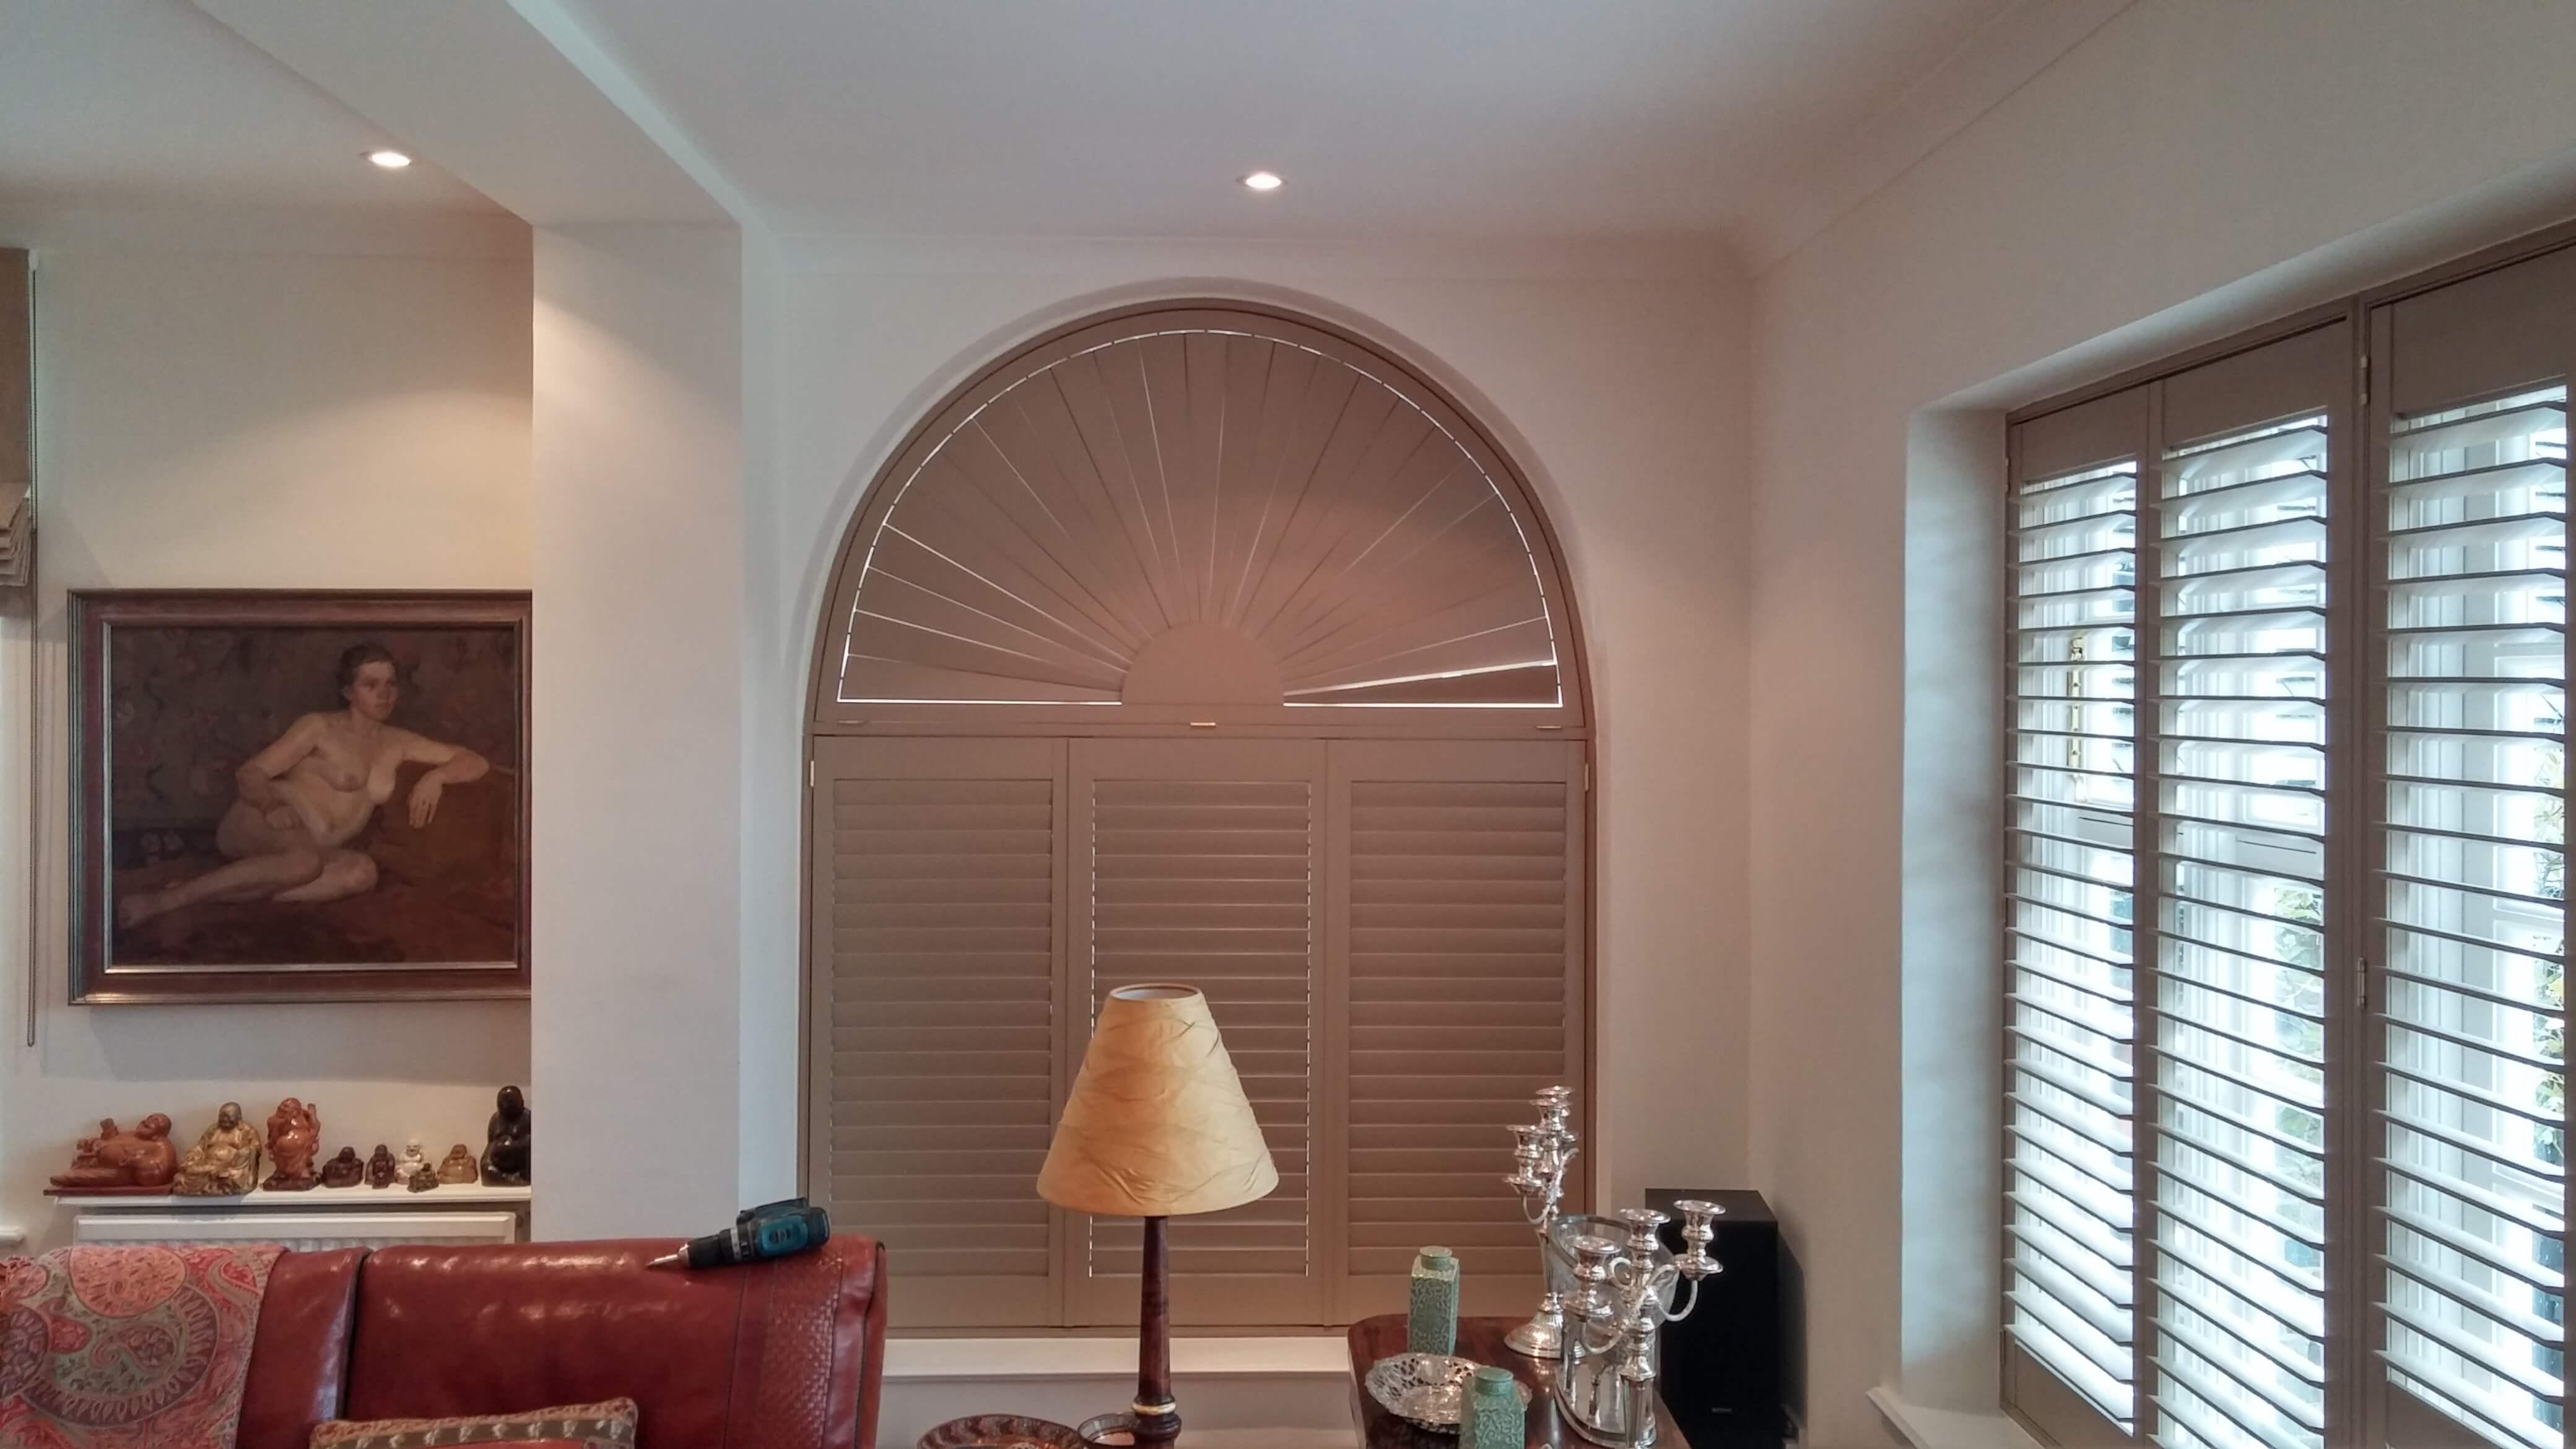 image of a window shutter for Shuttertec